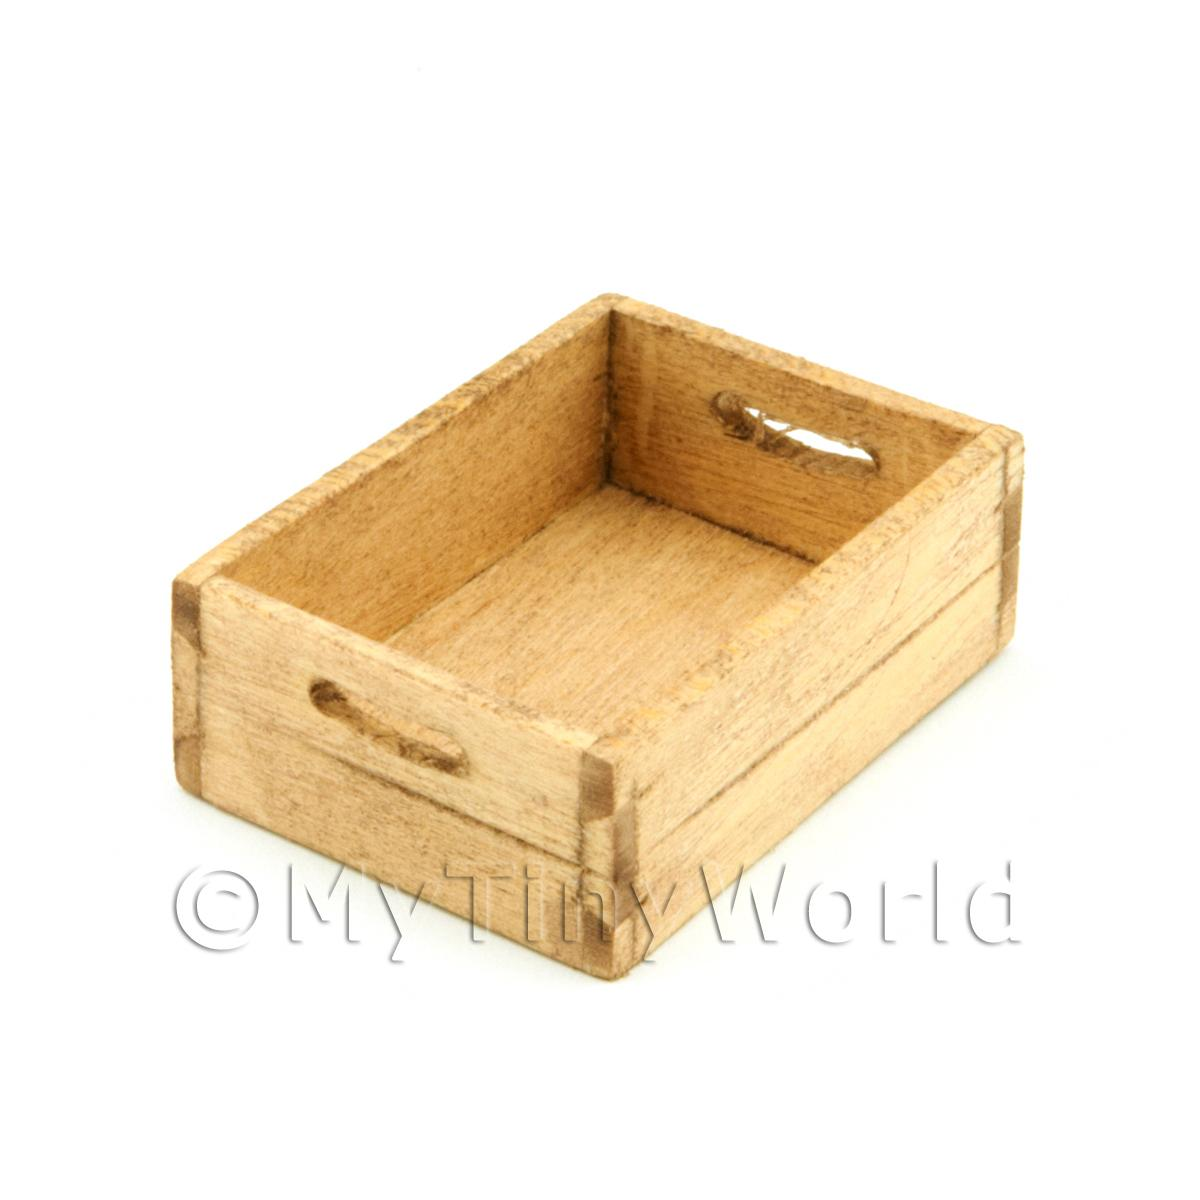 Wood bottle crates dolls house miniature mytinyworld for Craft crates